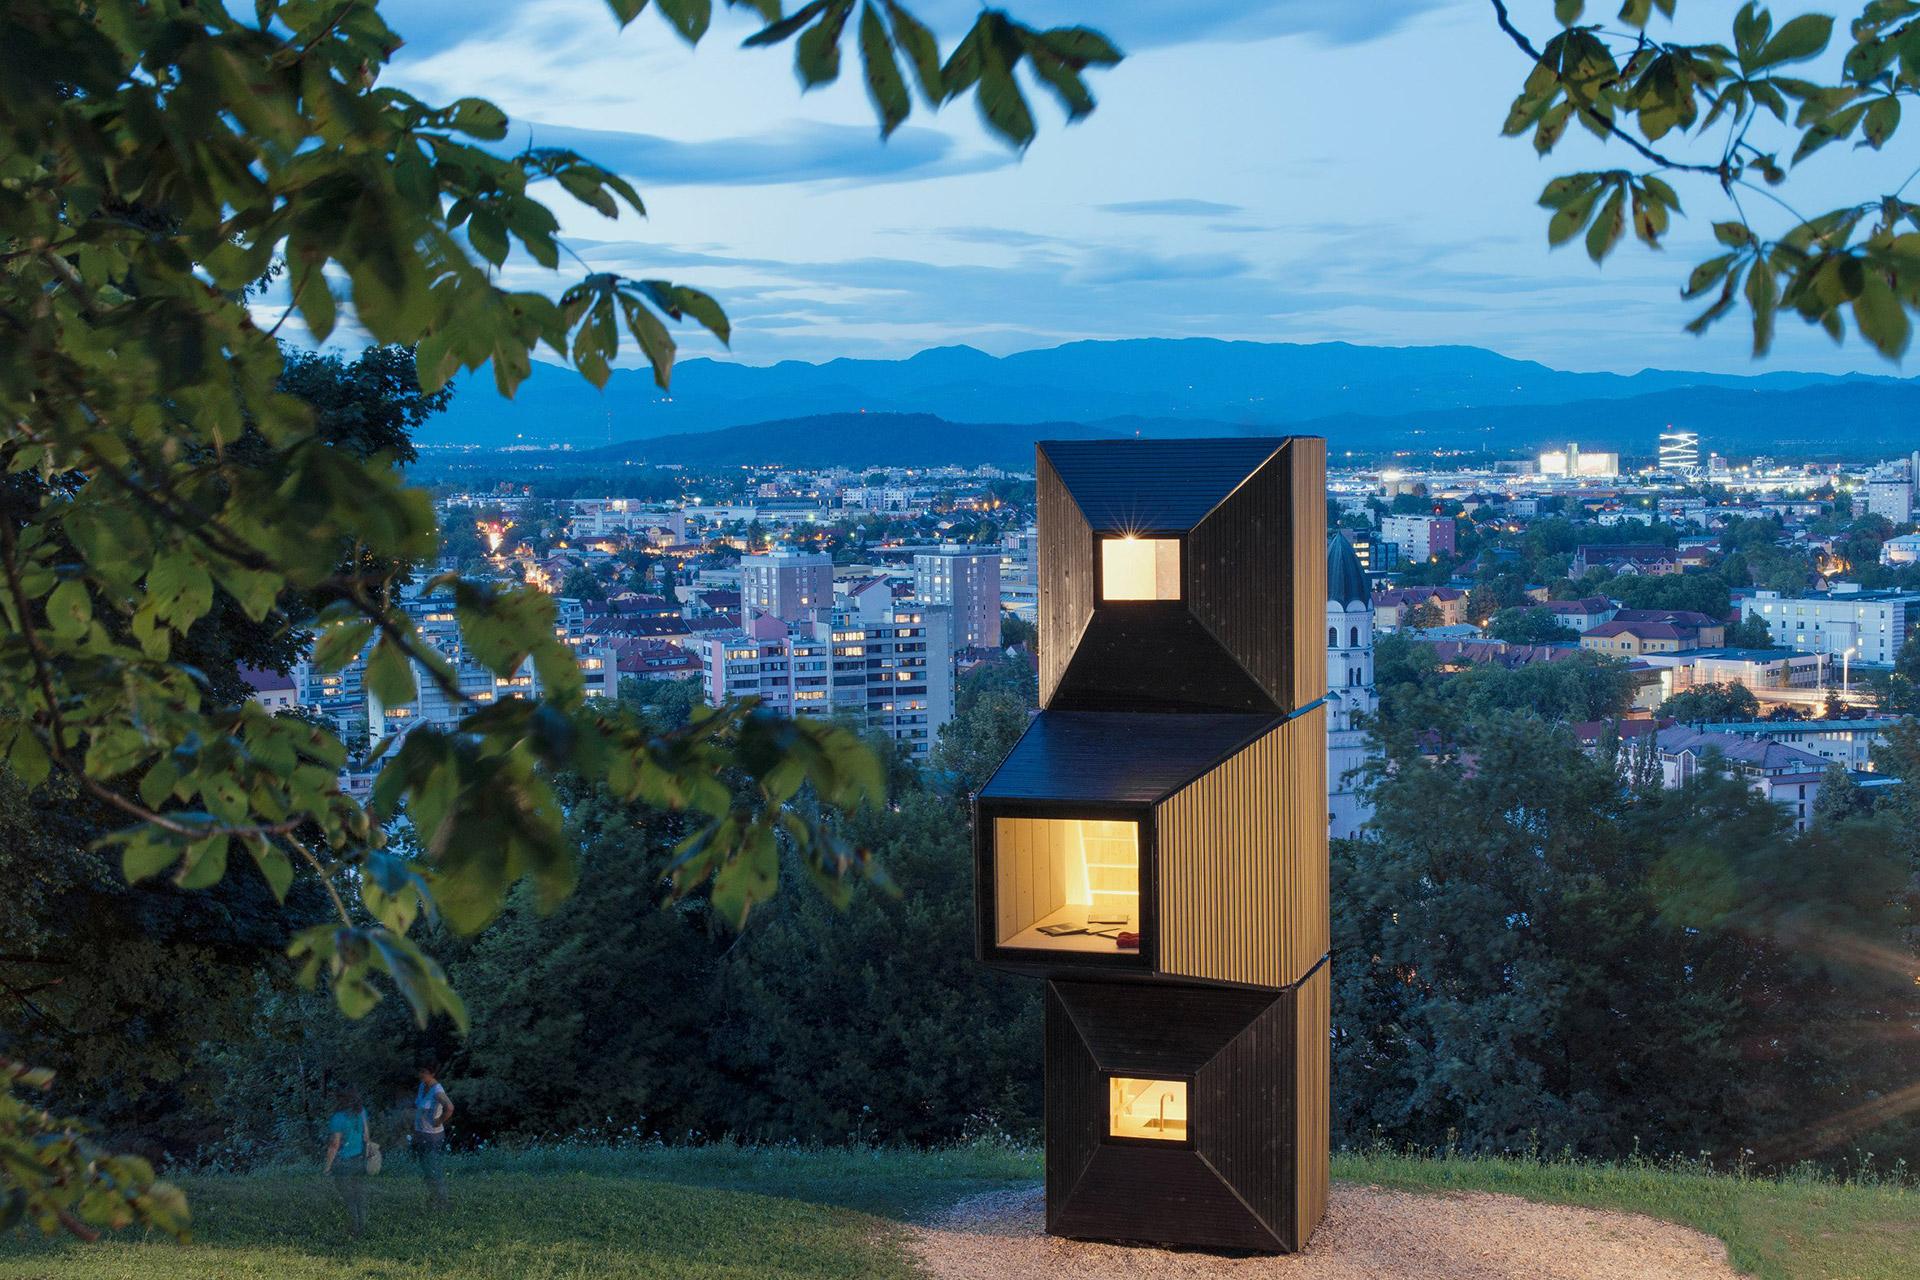 Ofis Modular Living Units